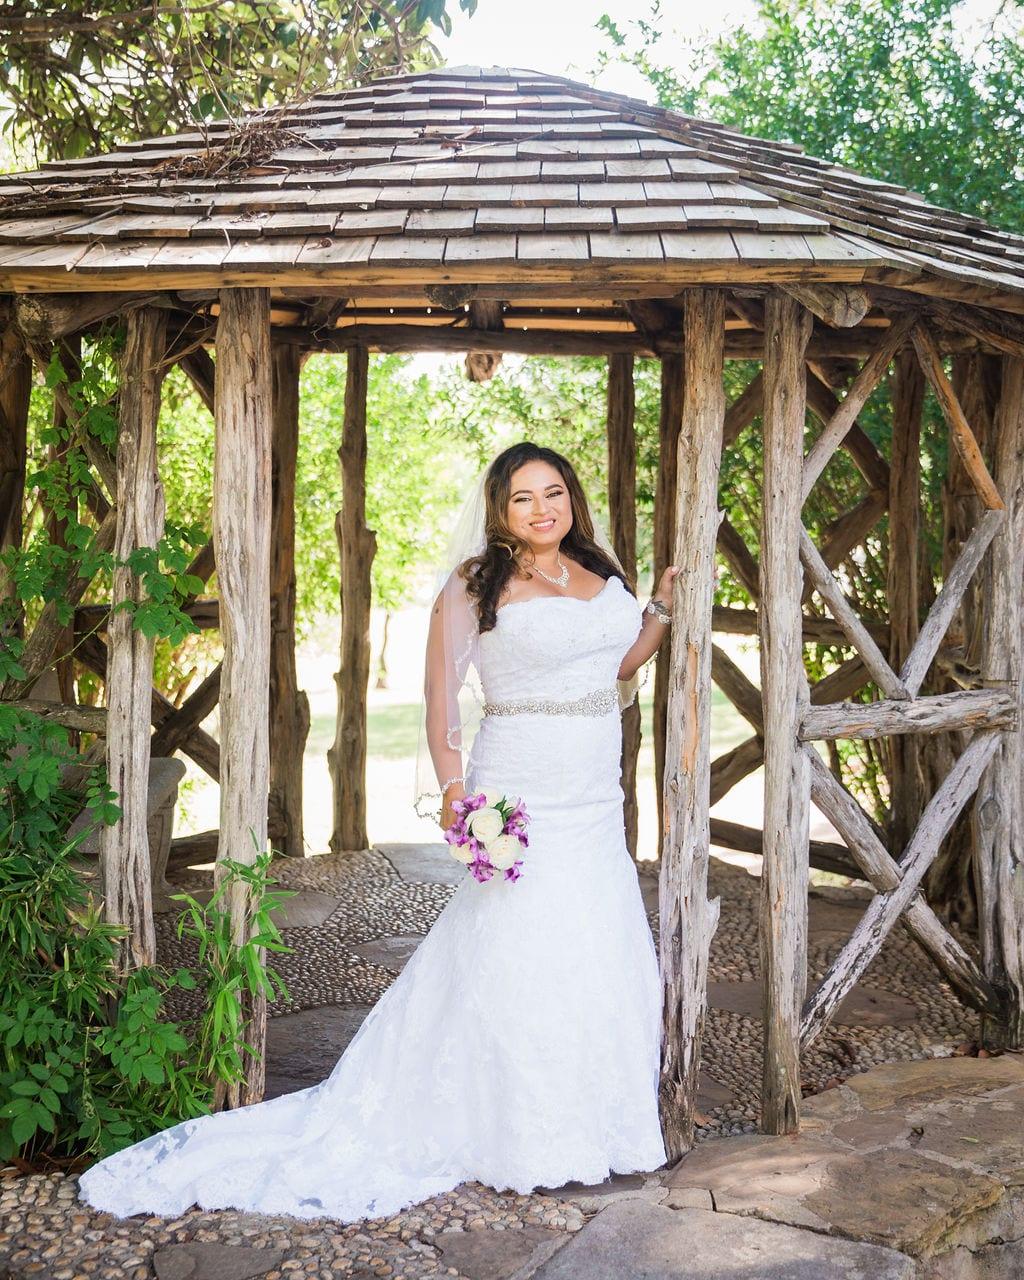 Linda's bridal session at the McNay in the Gazebo